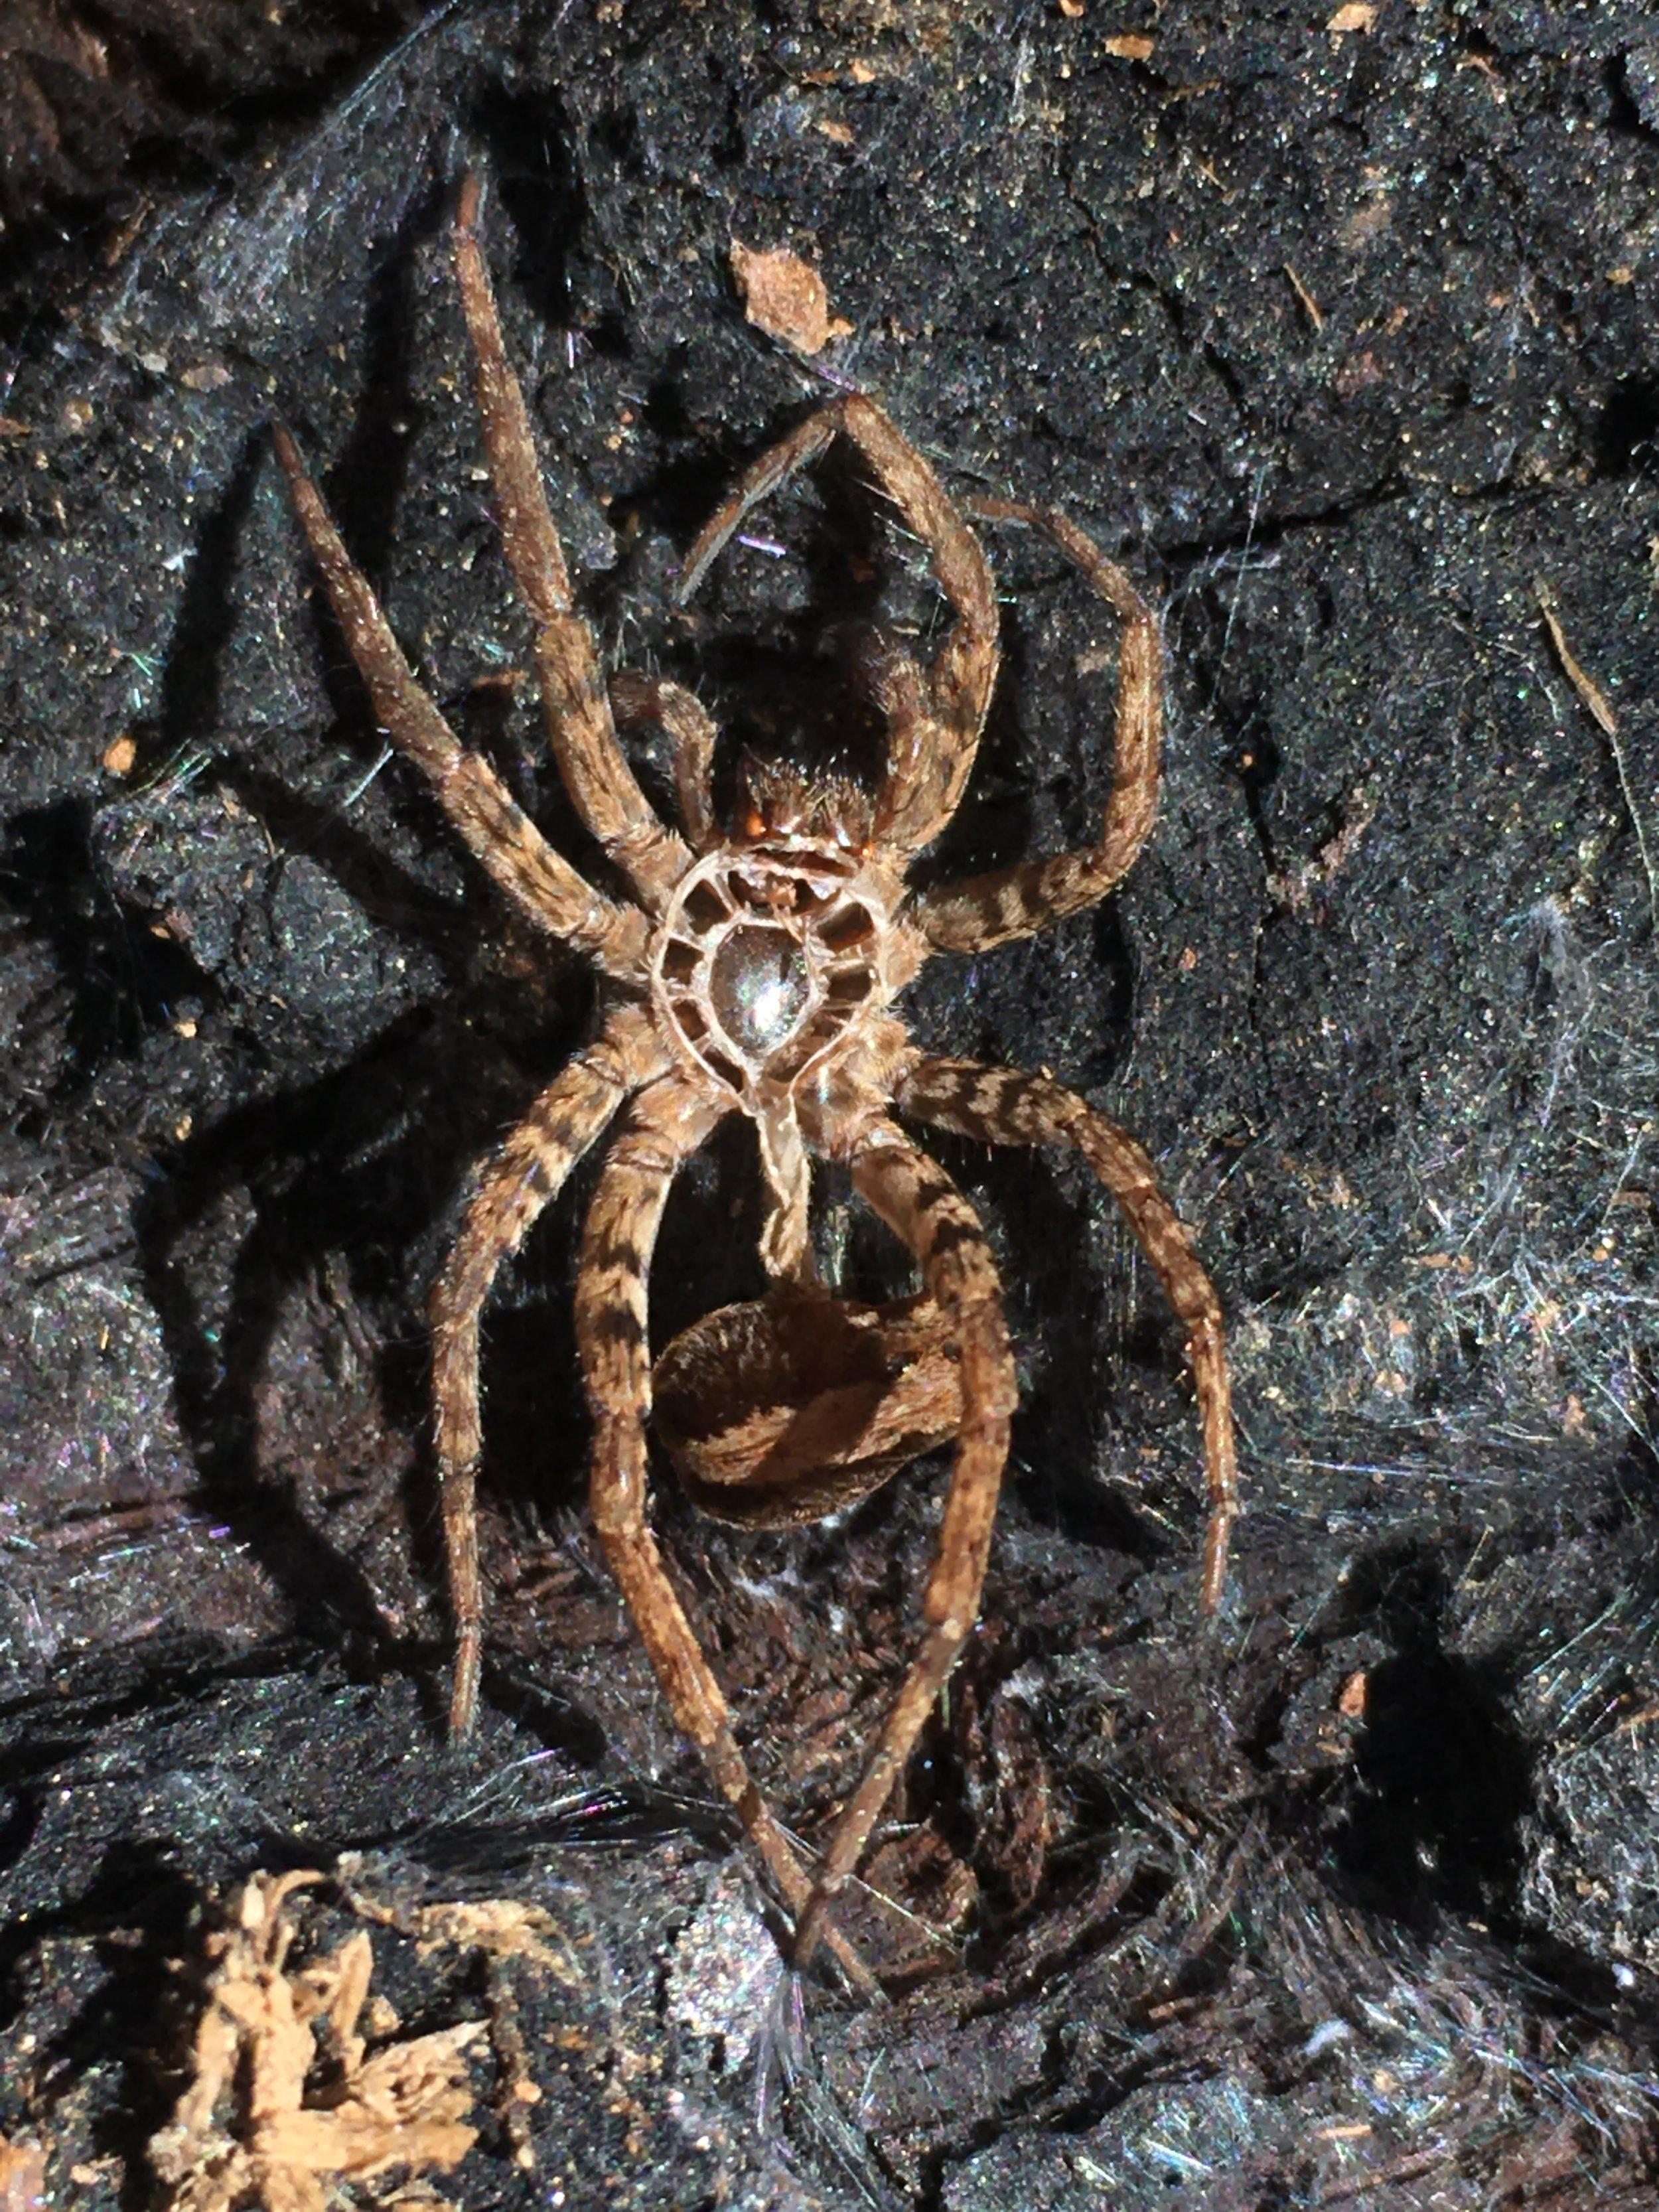 Spider molt